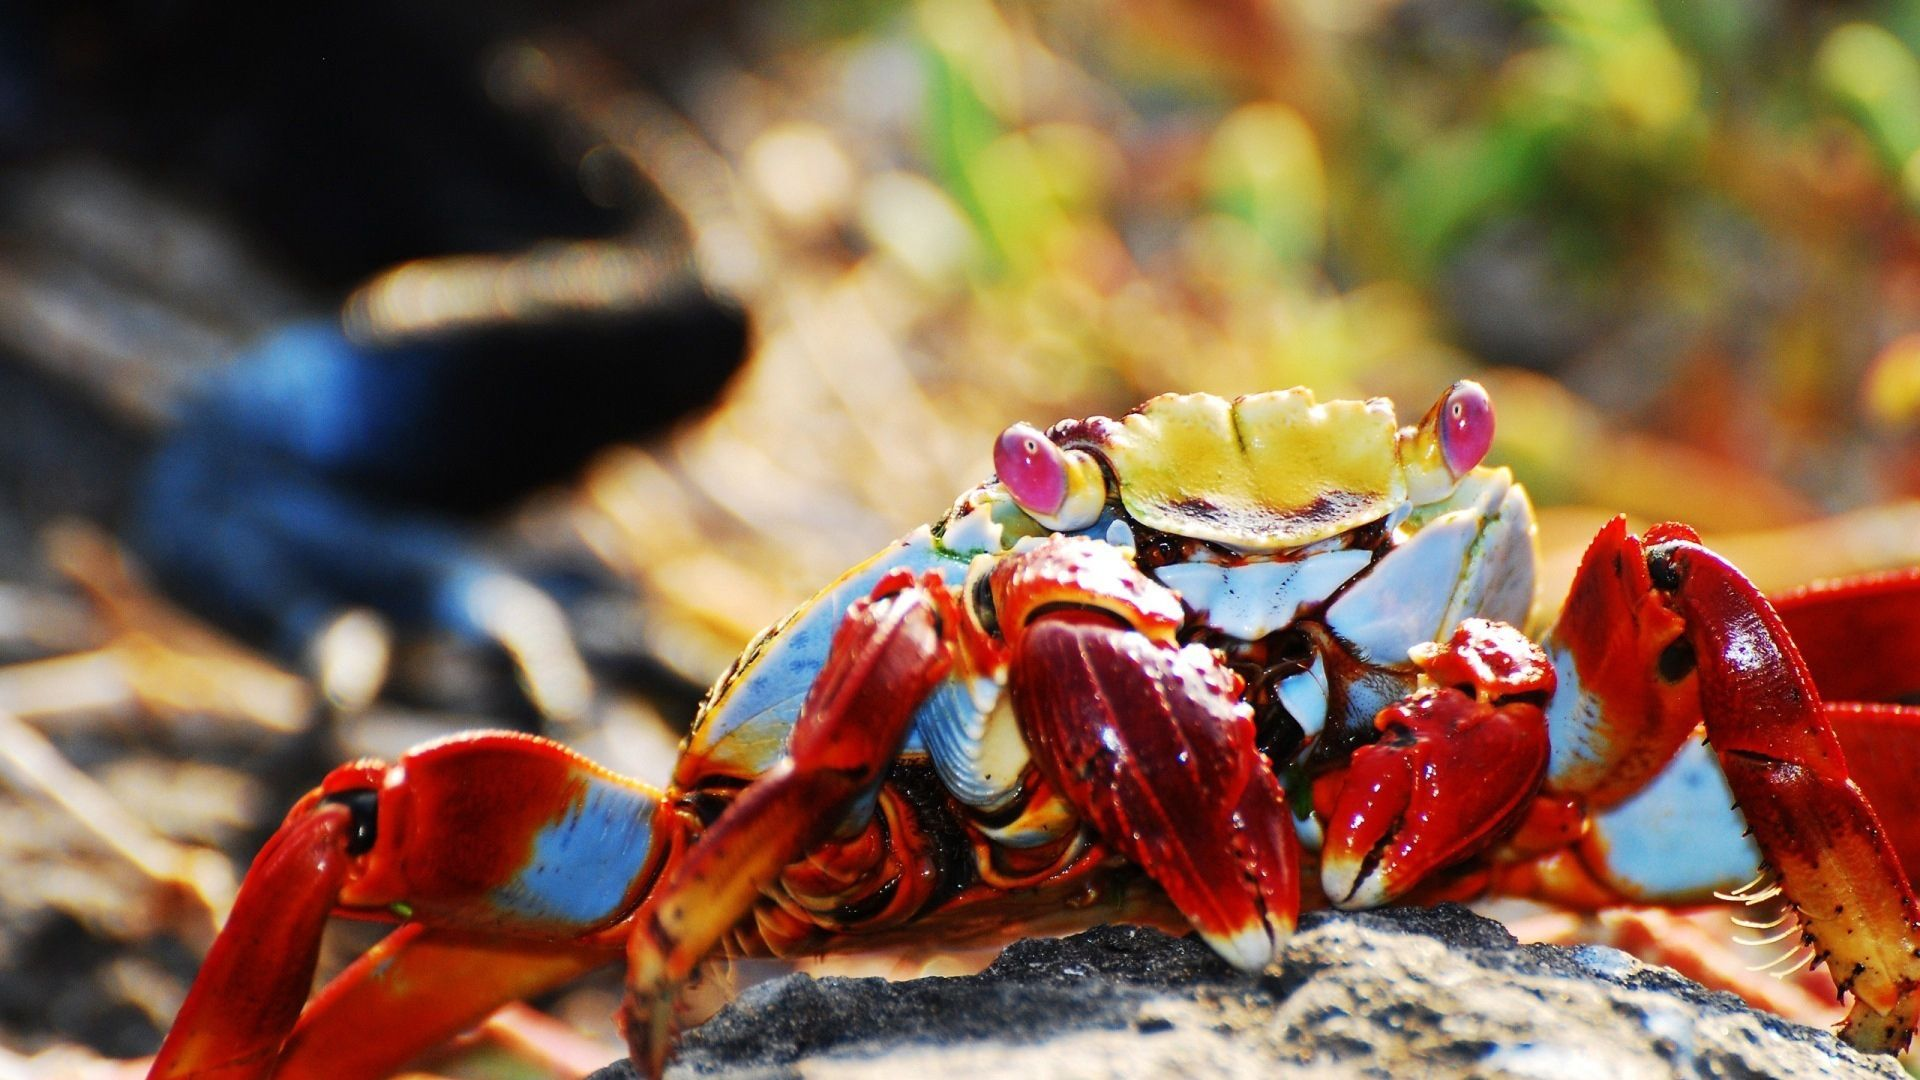 Crab wallpaper image